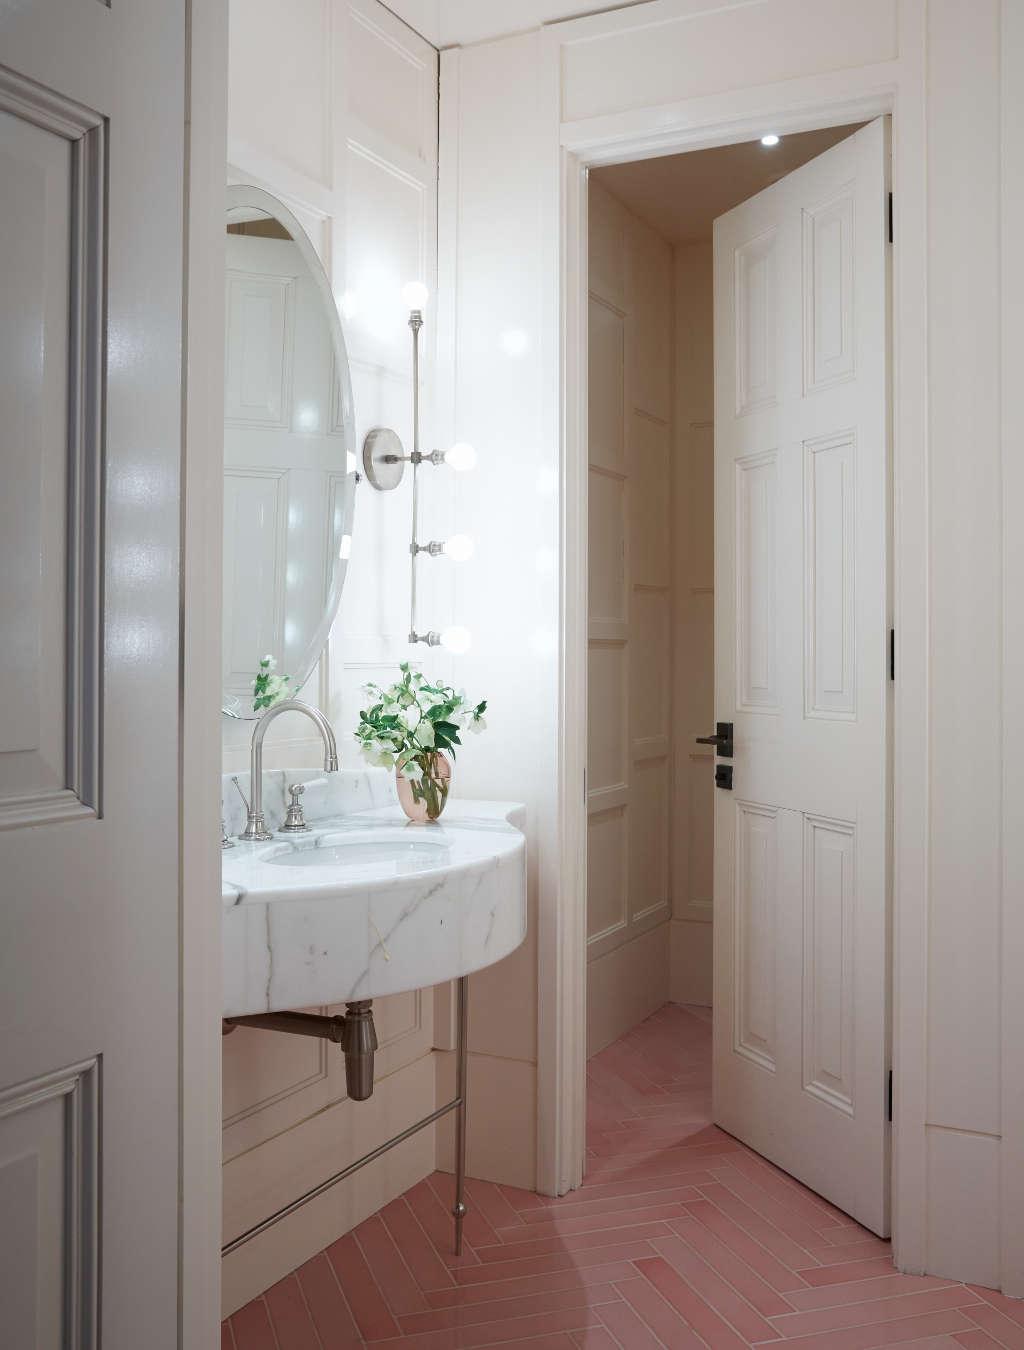 spring-restaurant-london-bathroom-remodelista